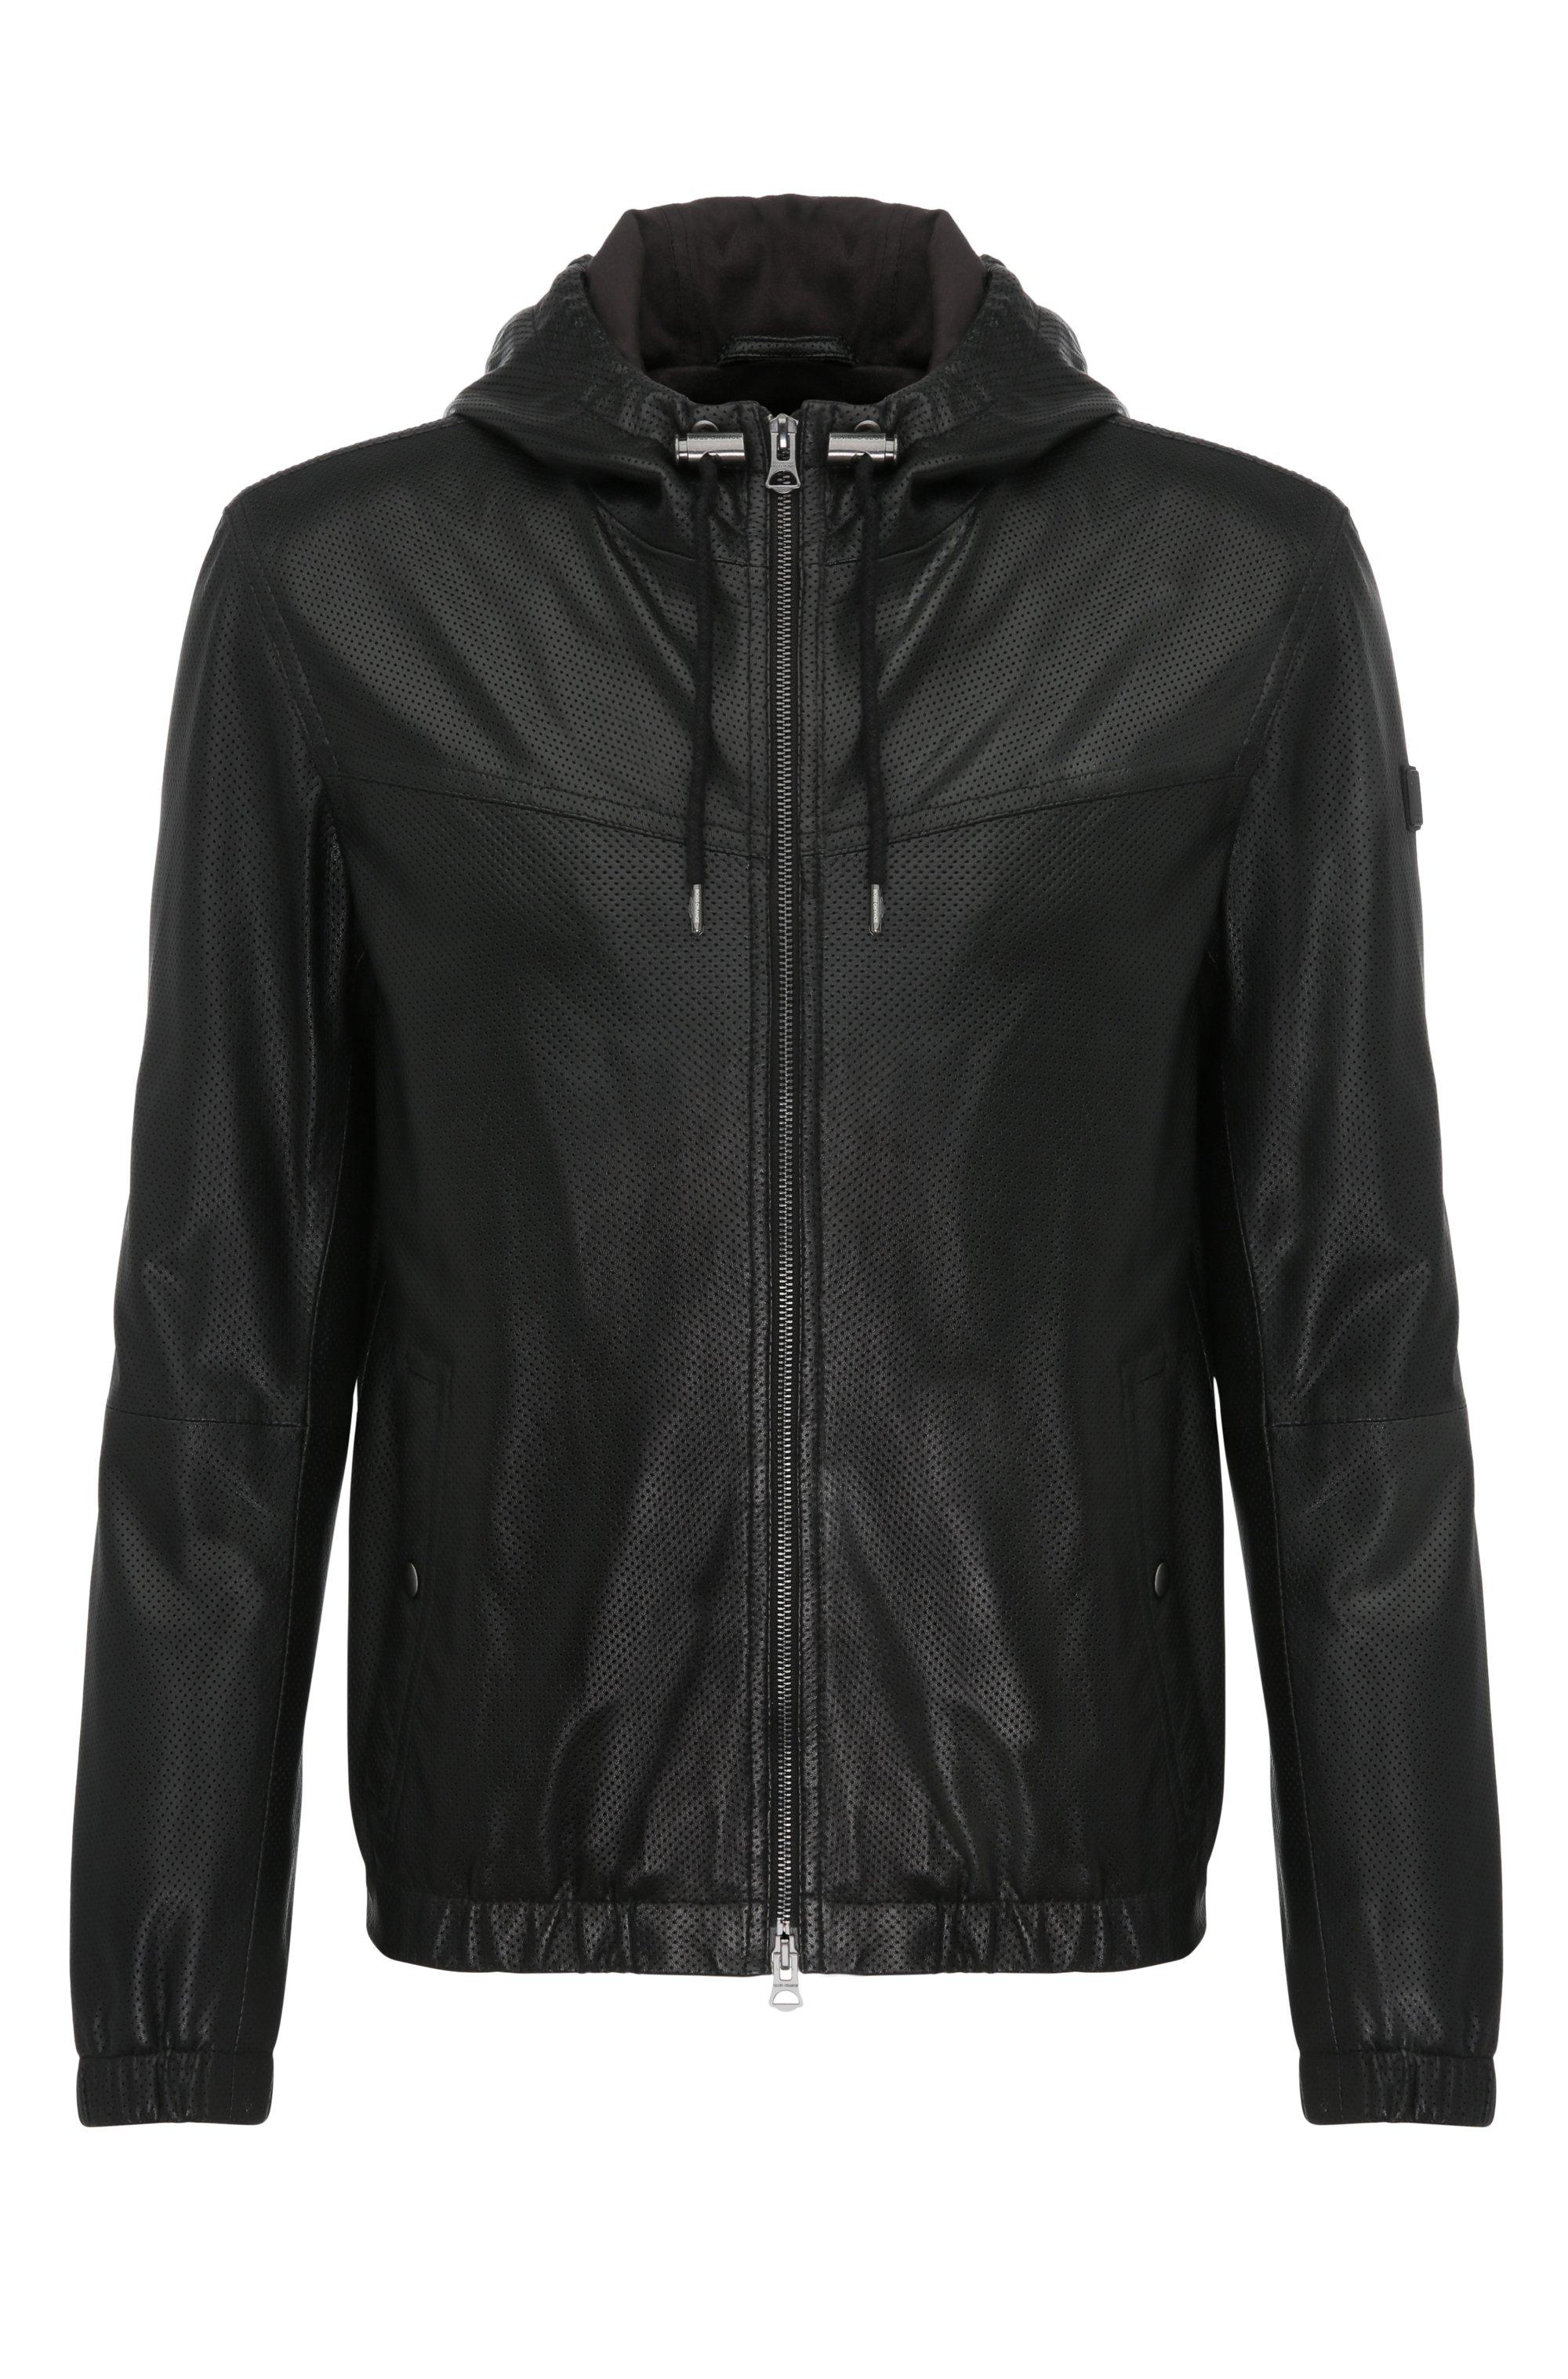 Lambskin Perforated Hooded Blouson Jacket | Jainee, Black